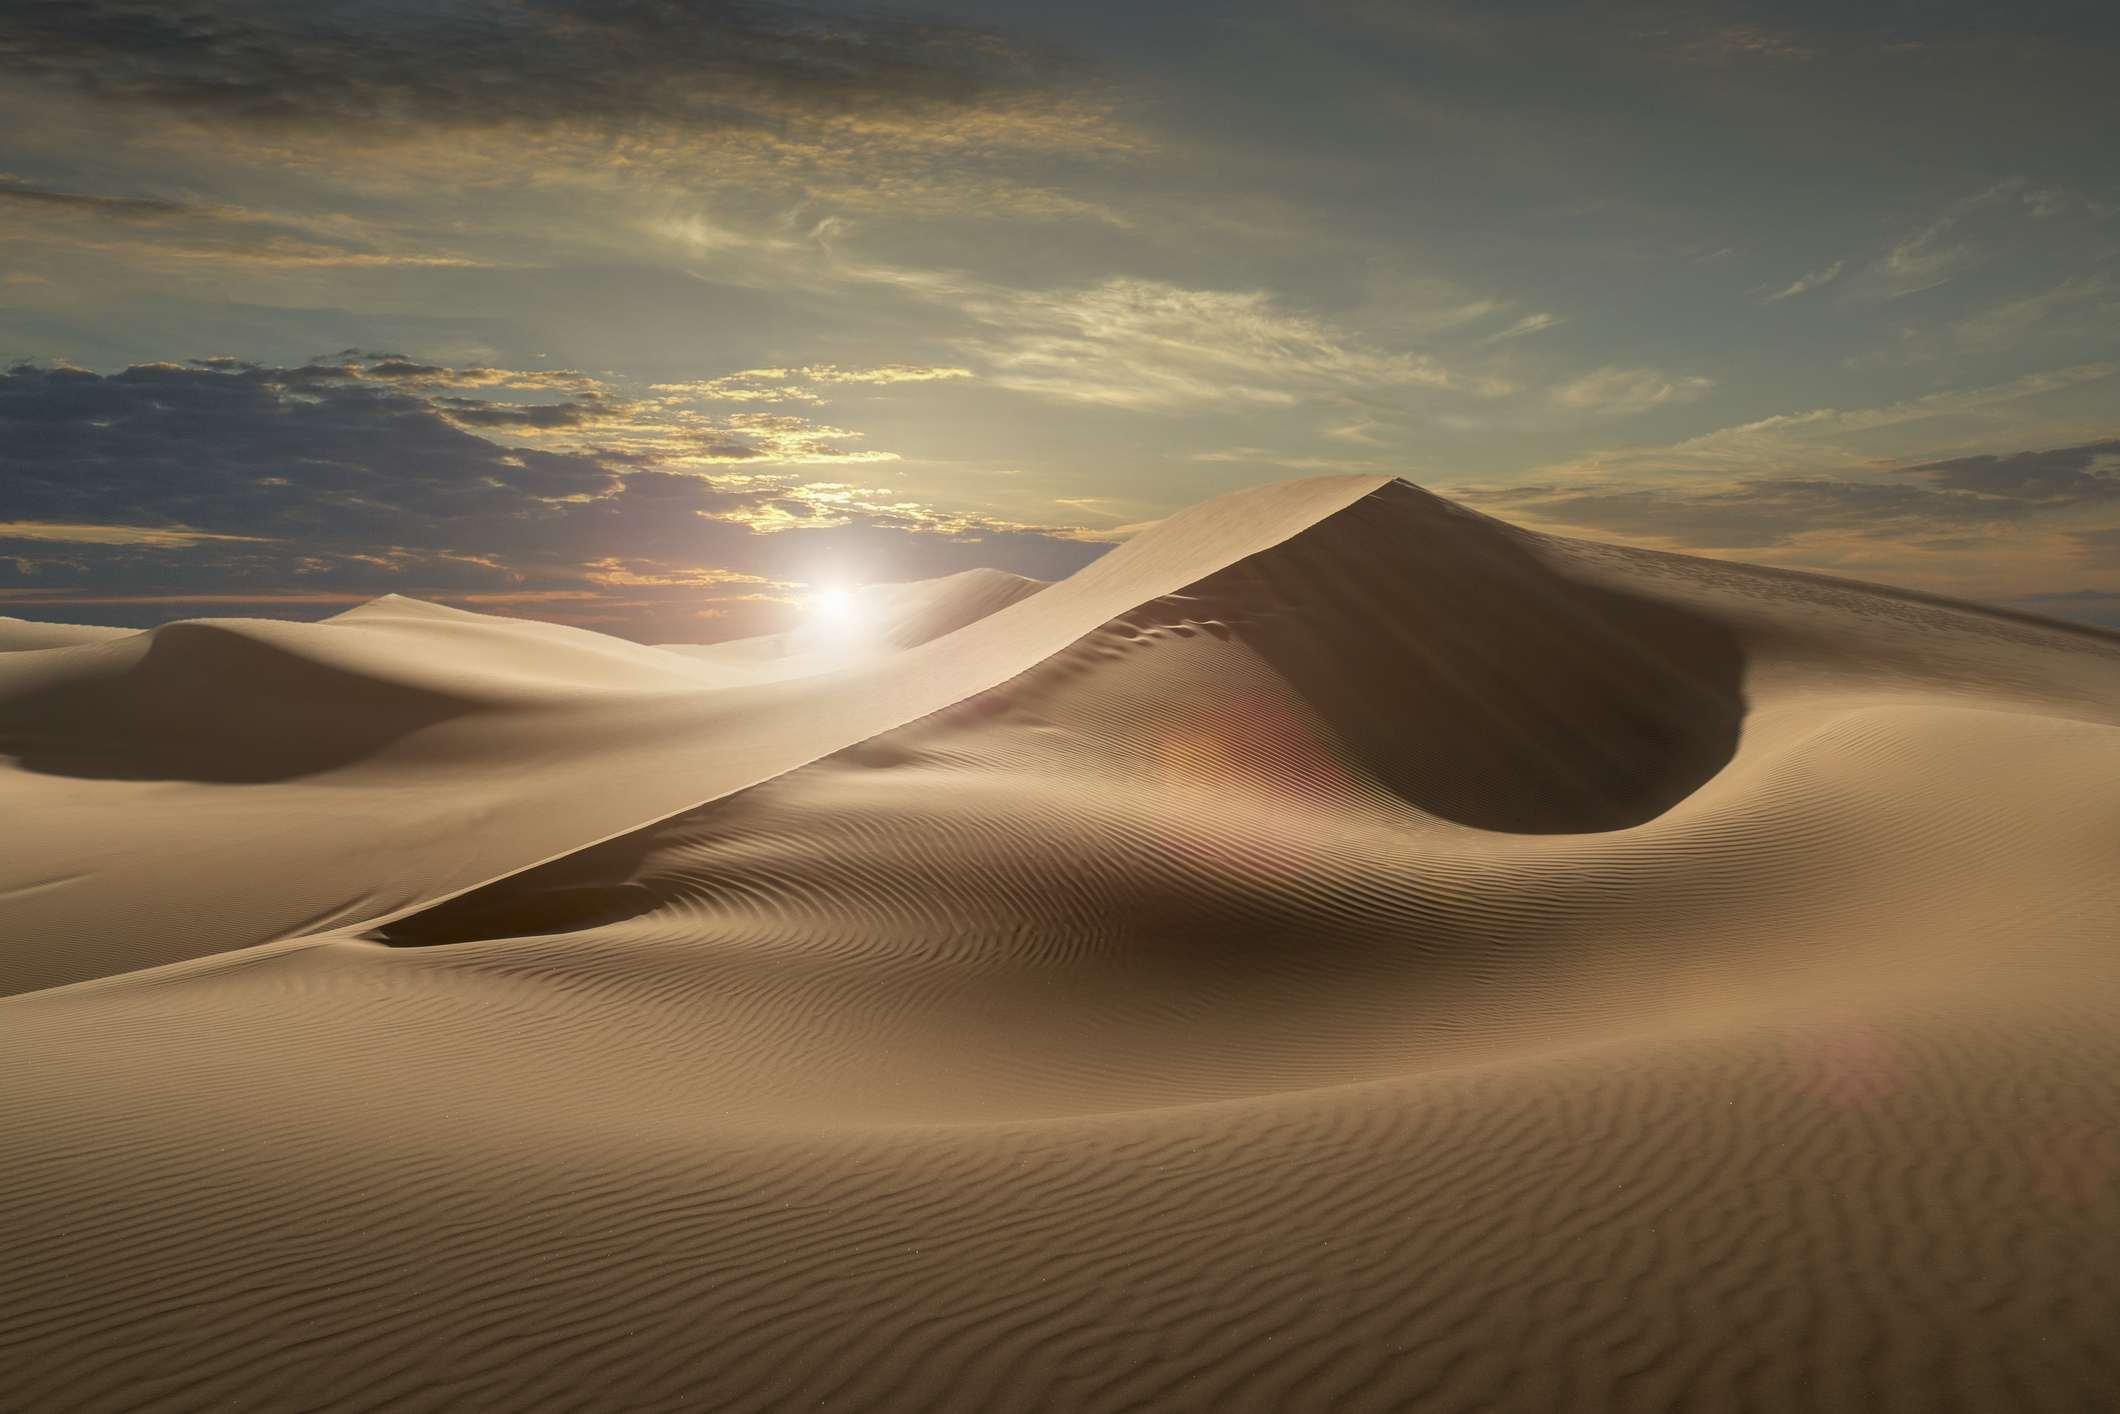 The Empty Quarter or Rub al Khali desert